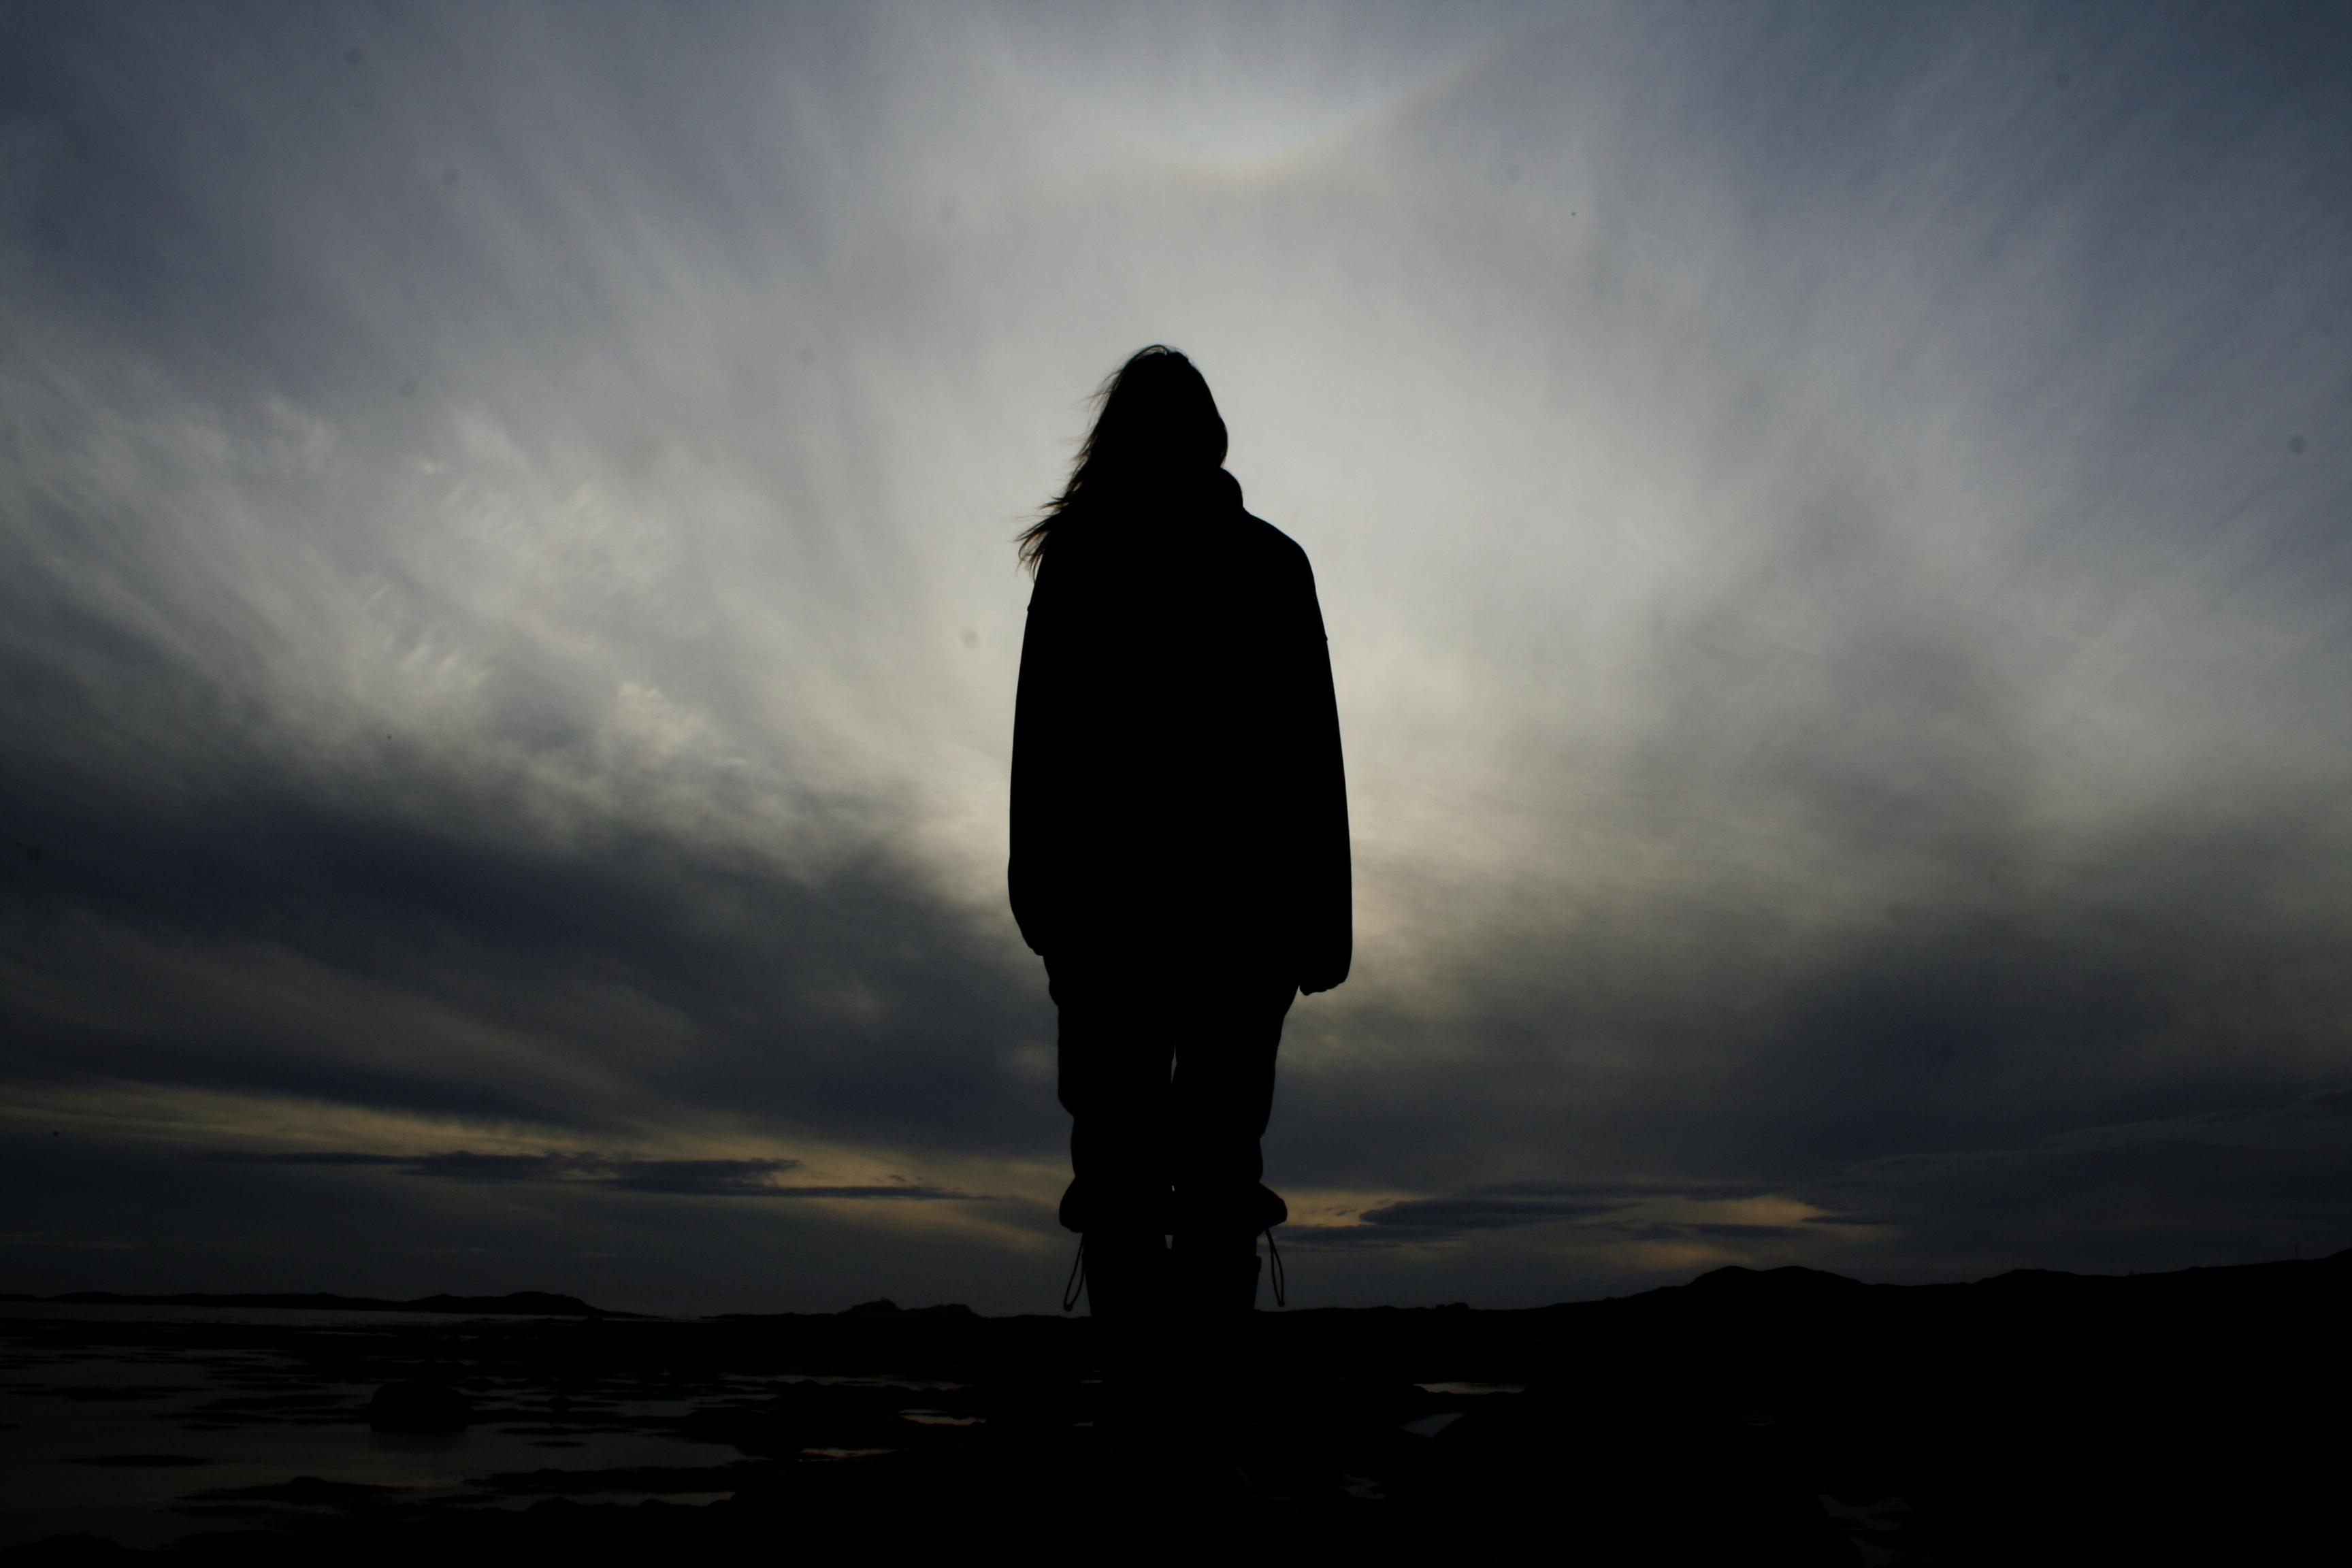 Картинки одиночества и пустоты, картинки